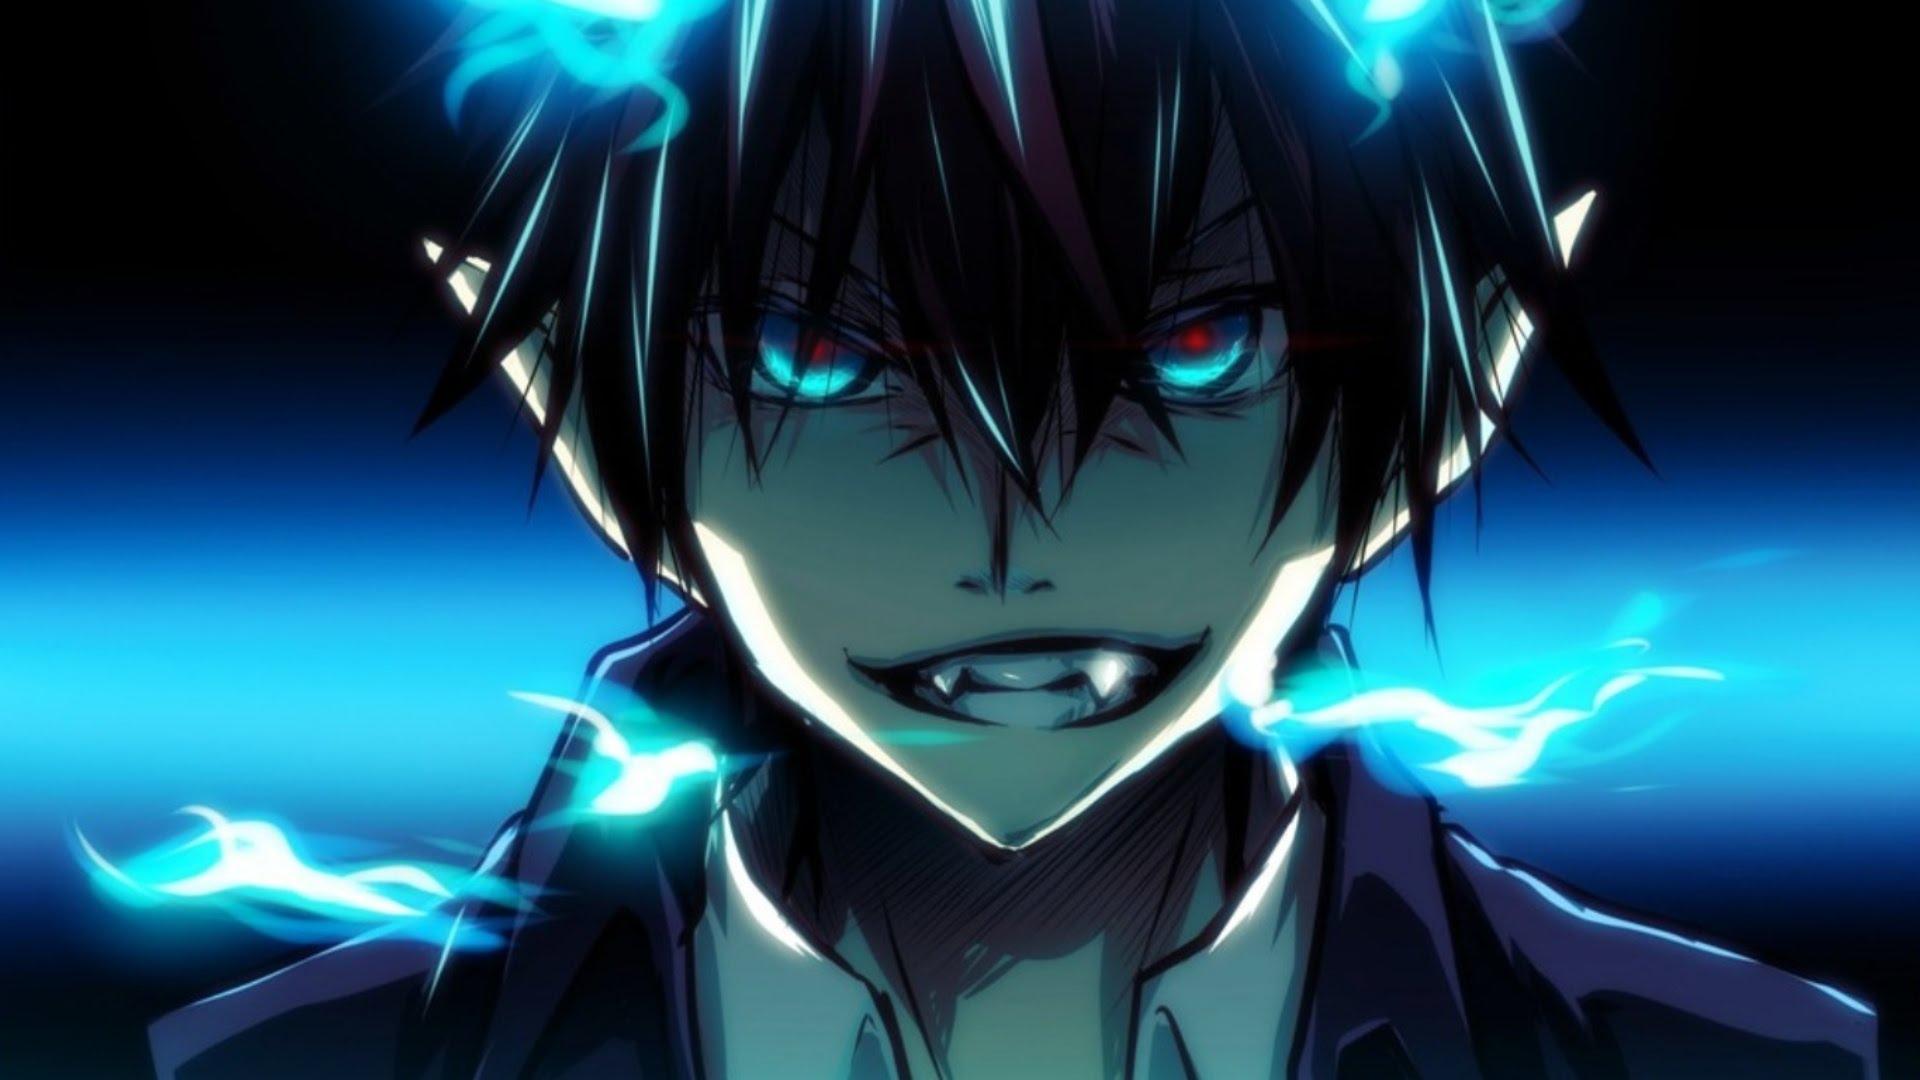 Blue Exorcist | Kyoto Impure King Arc - Tokyo Buzz Clips